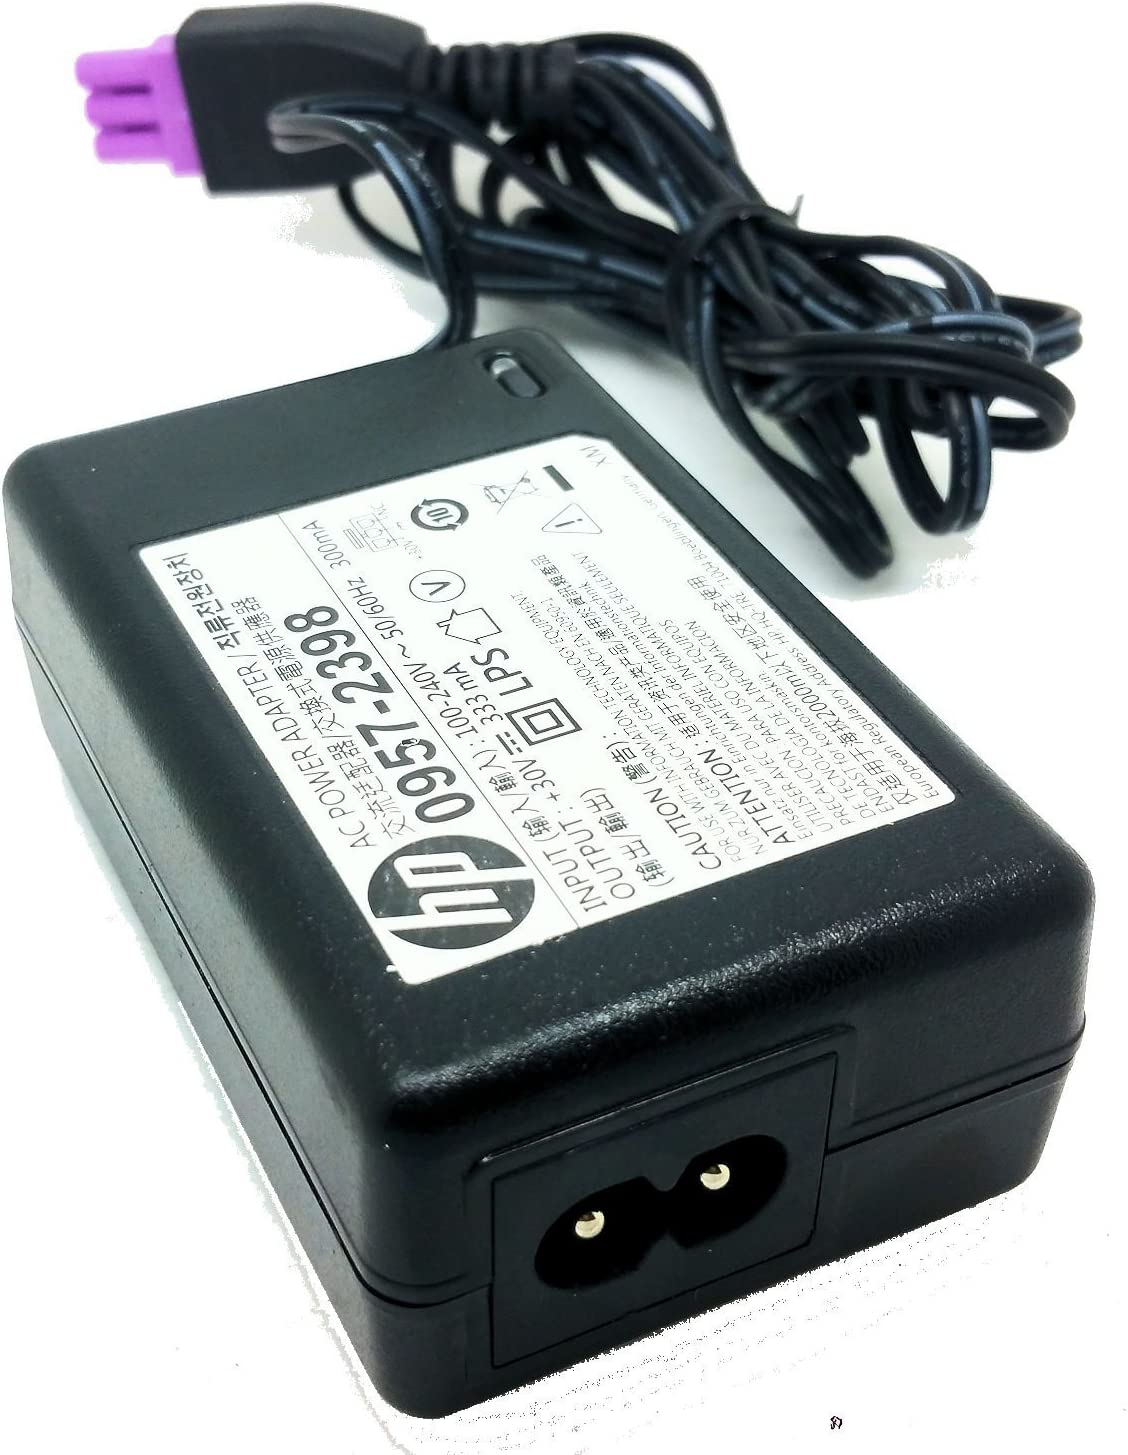 HP Deskjet 1050 All-in-One impresora J410 A J410g J410h Cable ...